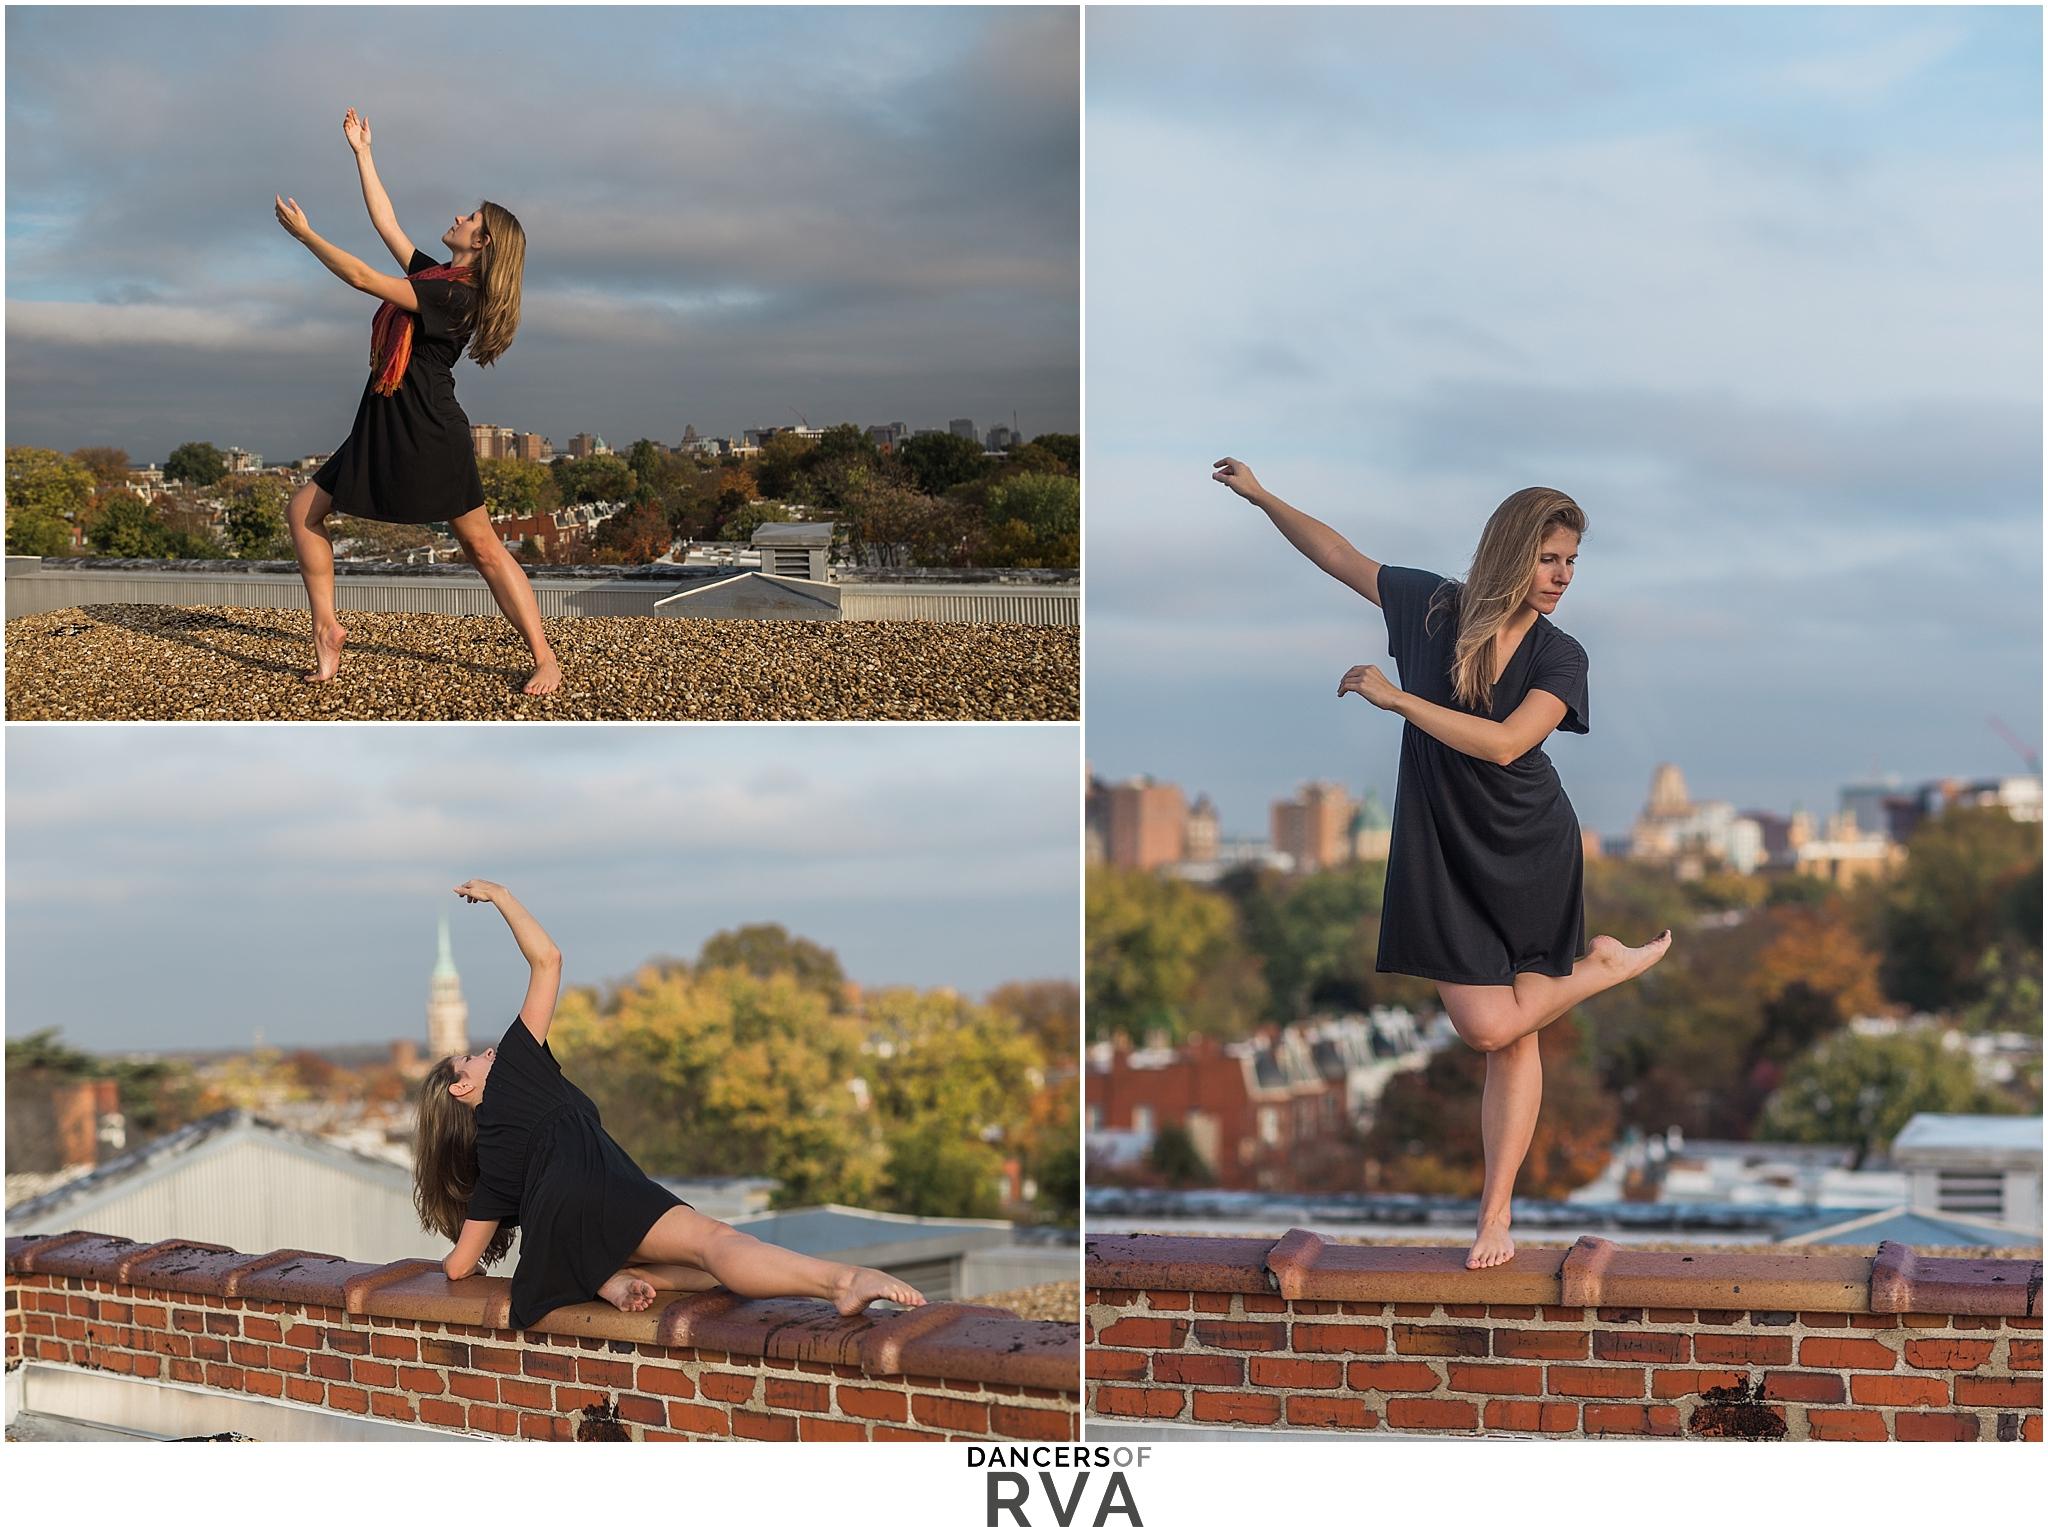 Binford Dance Teacher modern dance routine on roof top of Binford in downtown, Richmond VA.